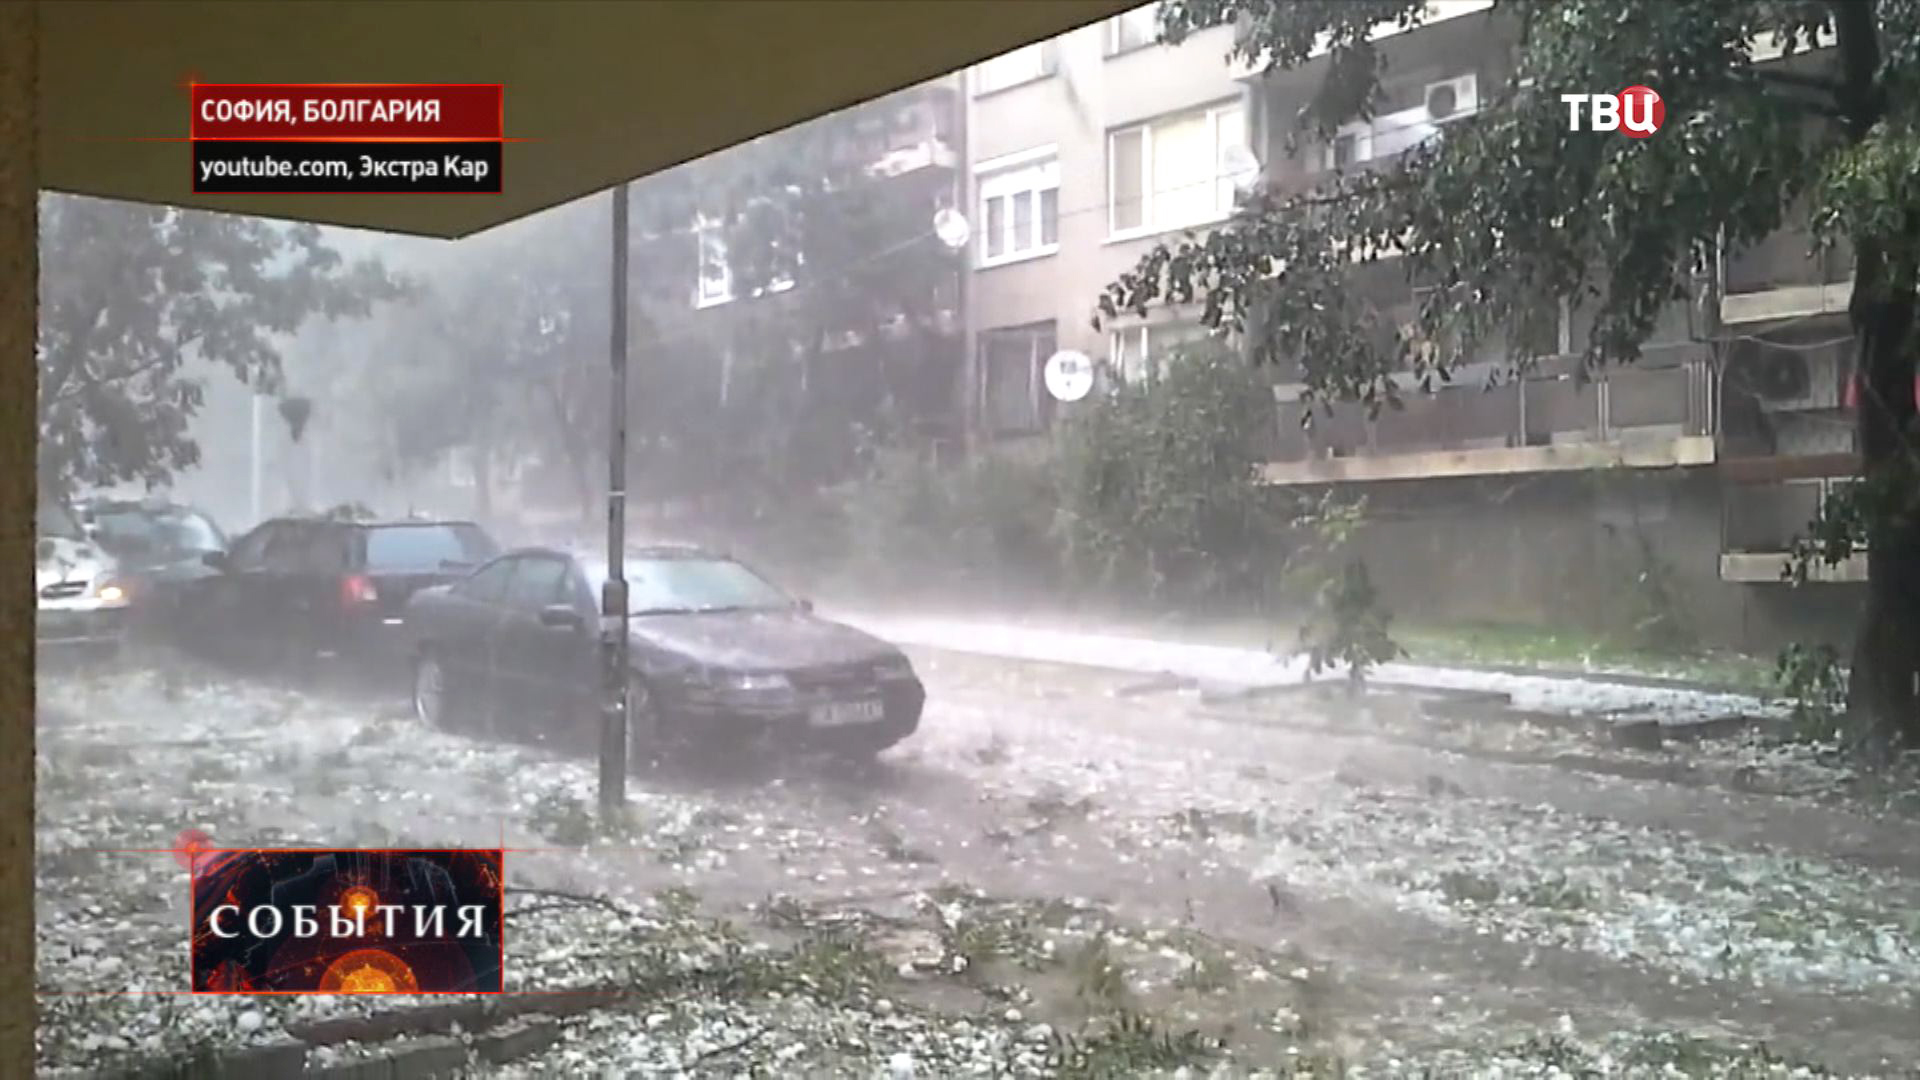 Сильный град в Болгарии